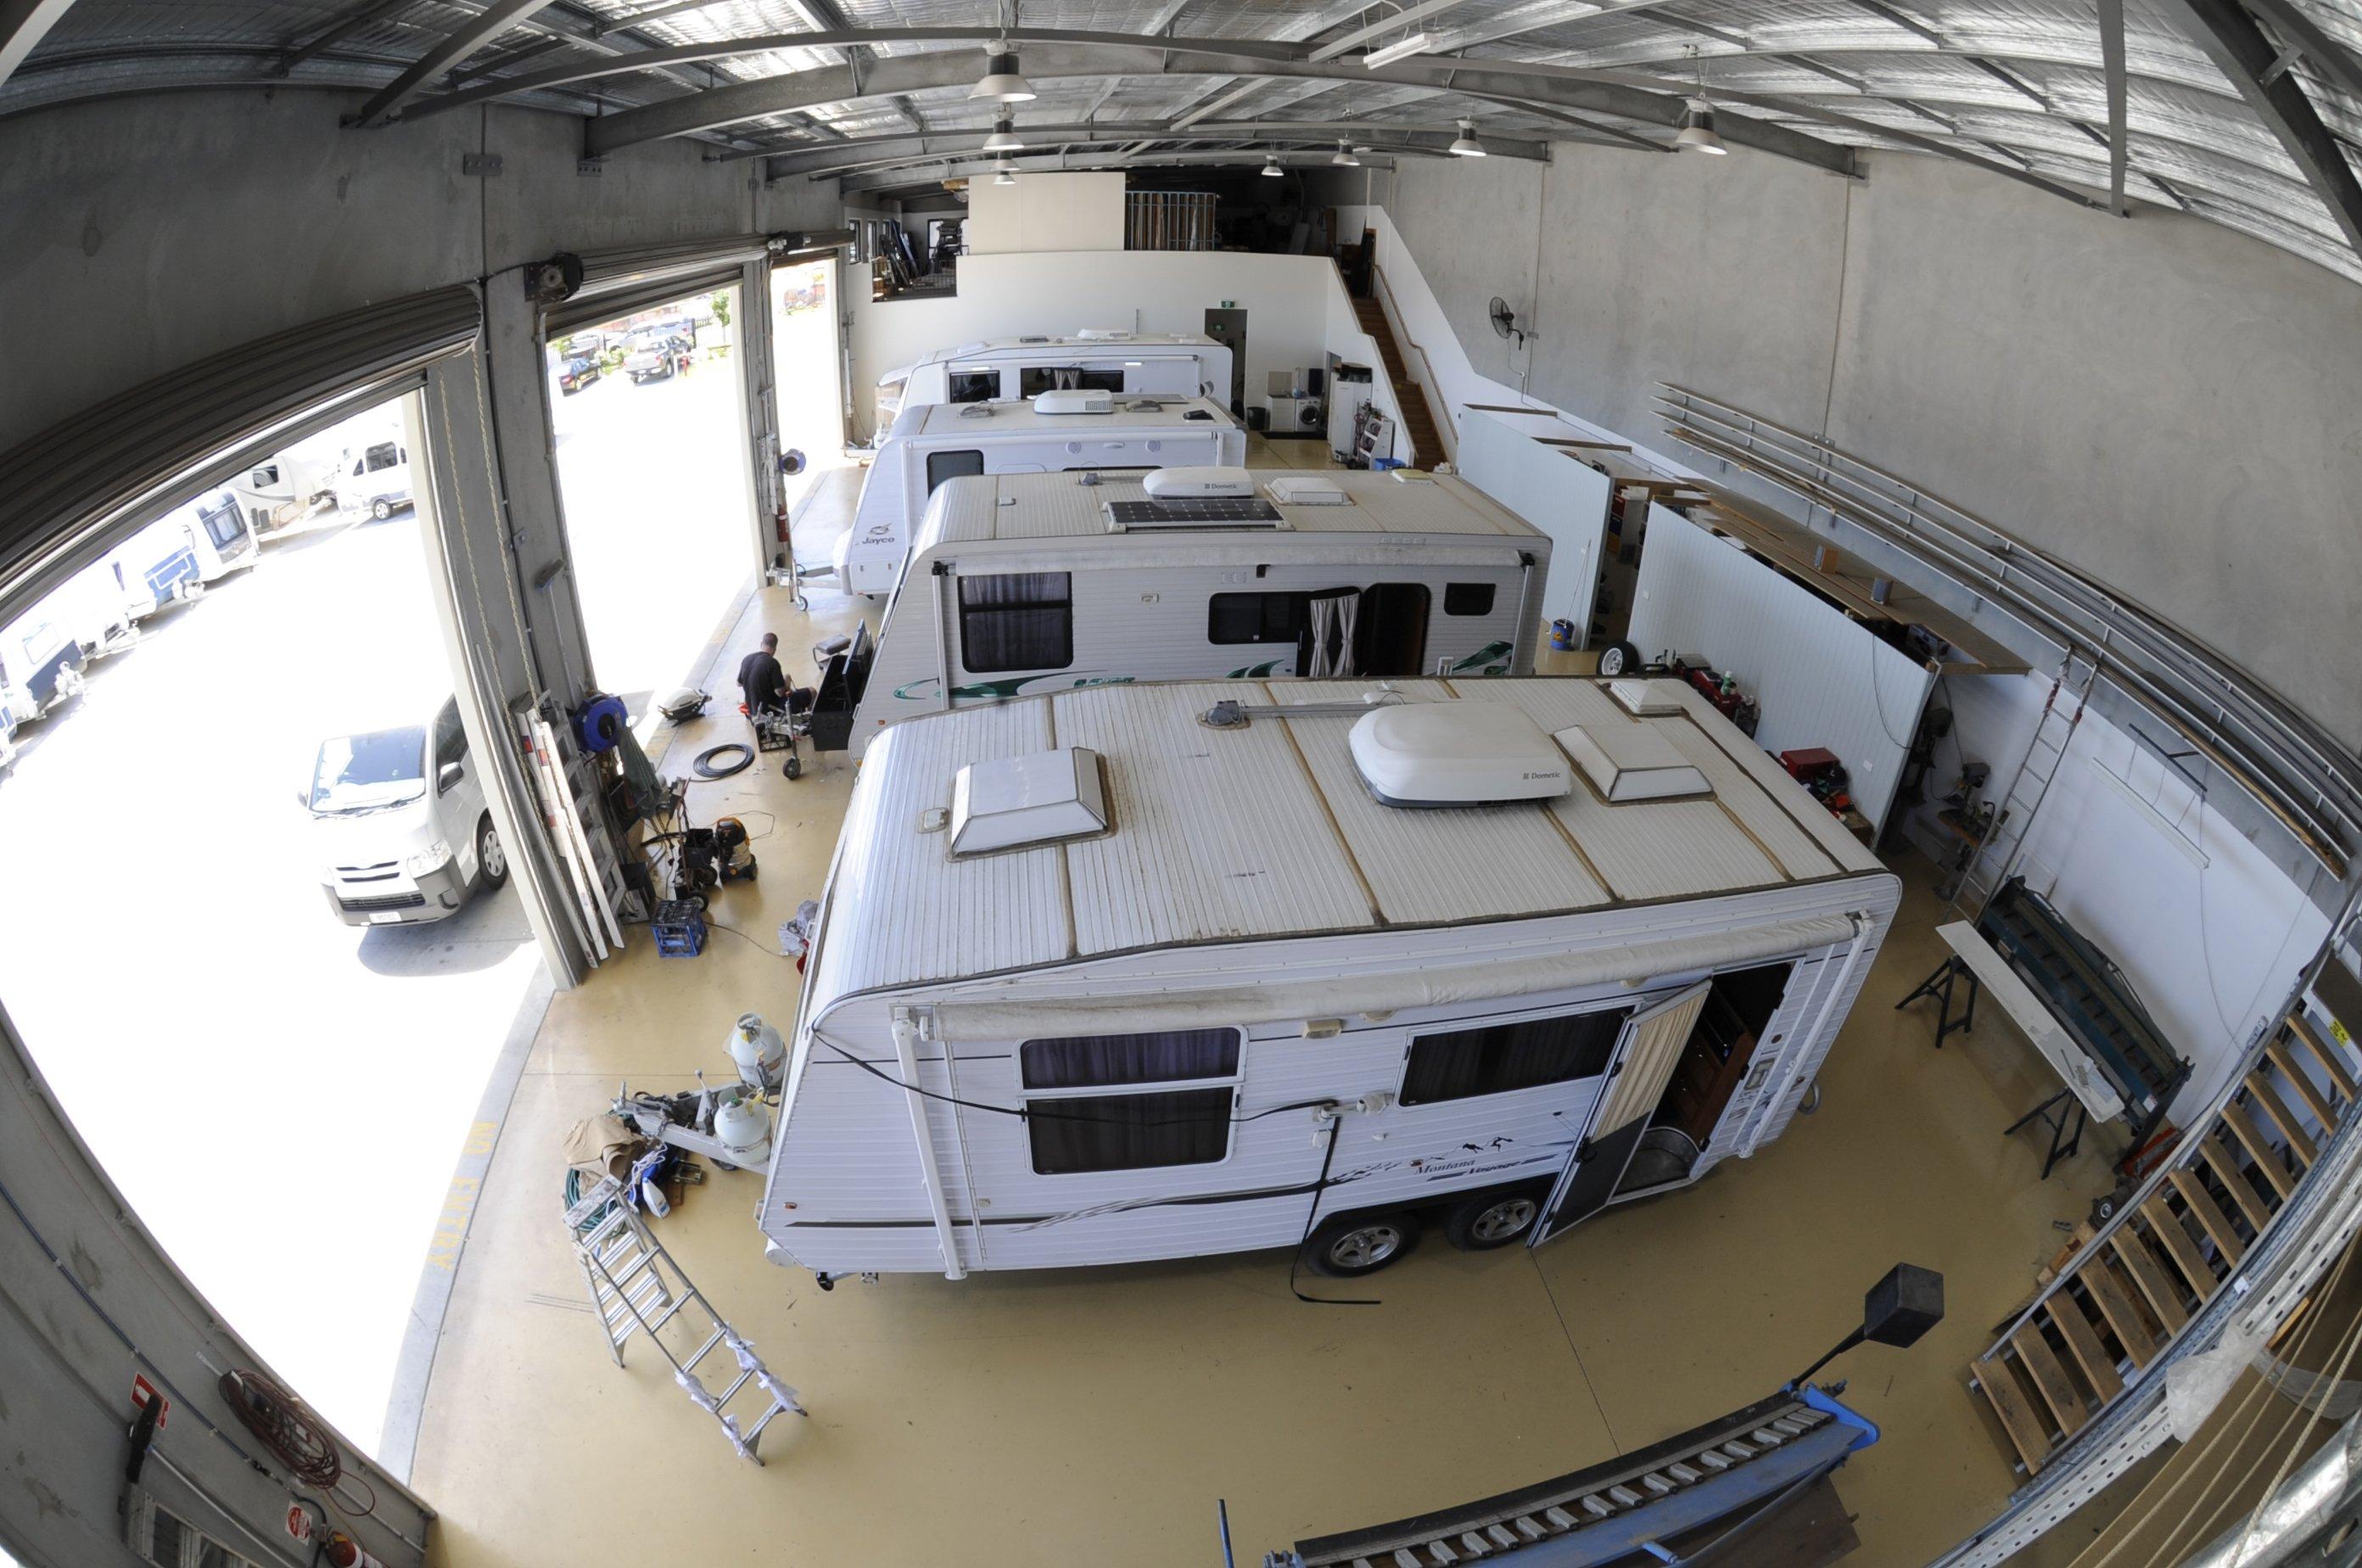 Luxurious caravan